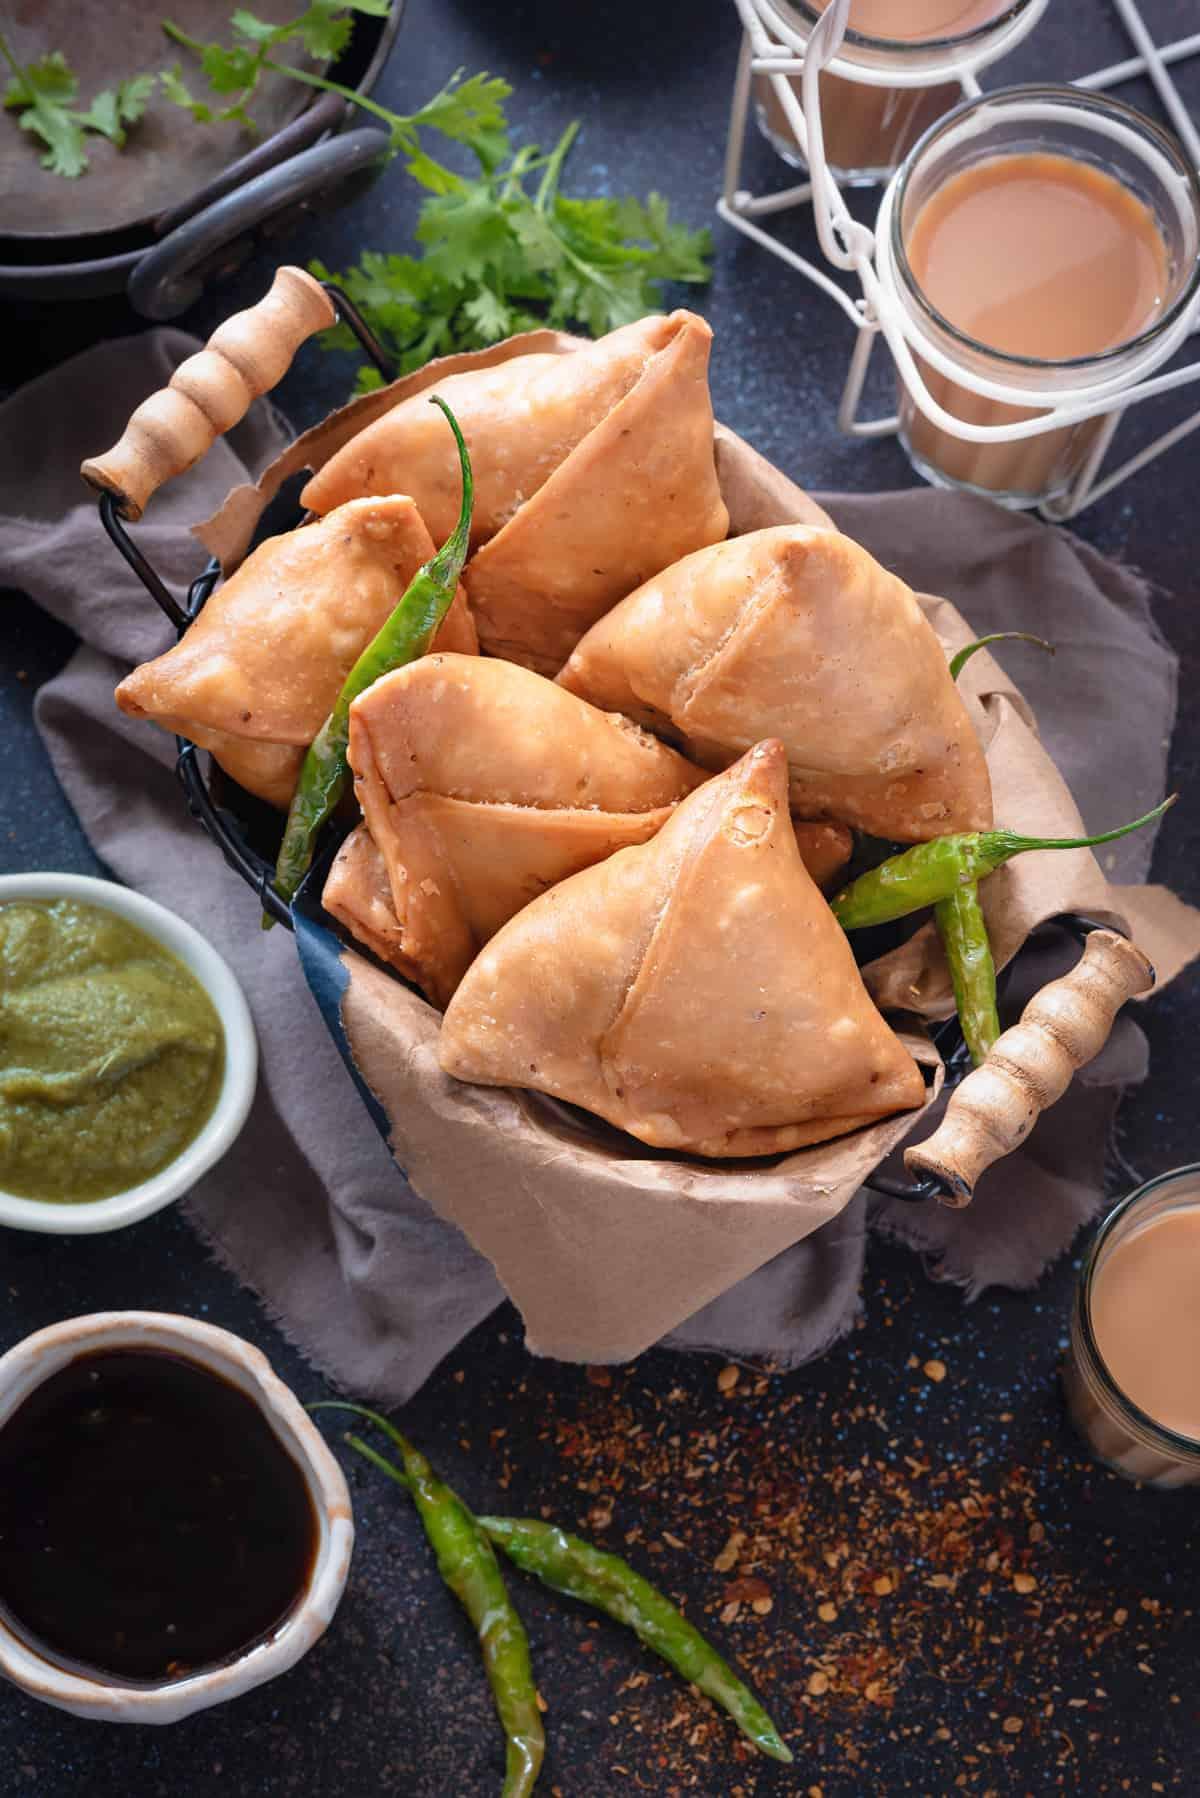 Overhead shot of flaky Indian Punjabi samosa in basket, tea and chutney on the side.